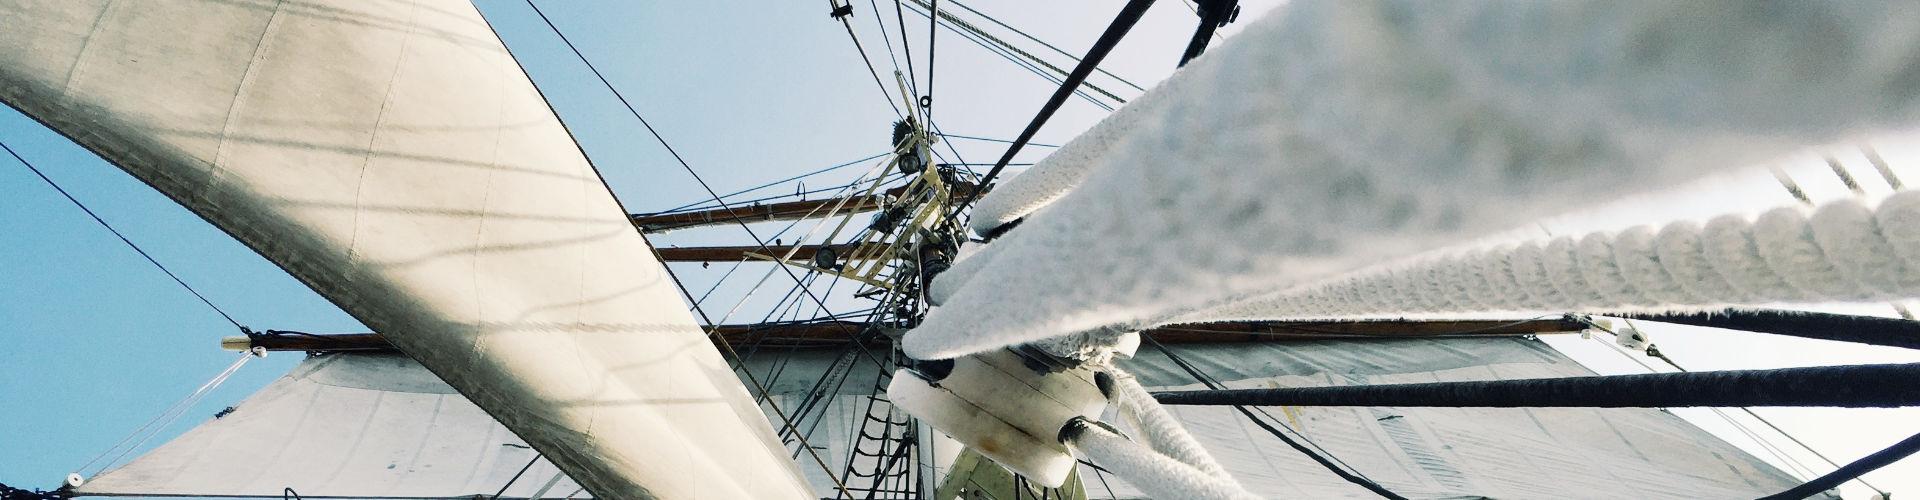 Mijlenmaker van Kiel naar Cascais